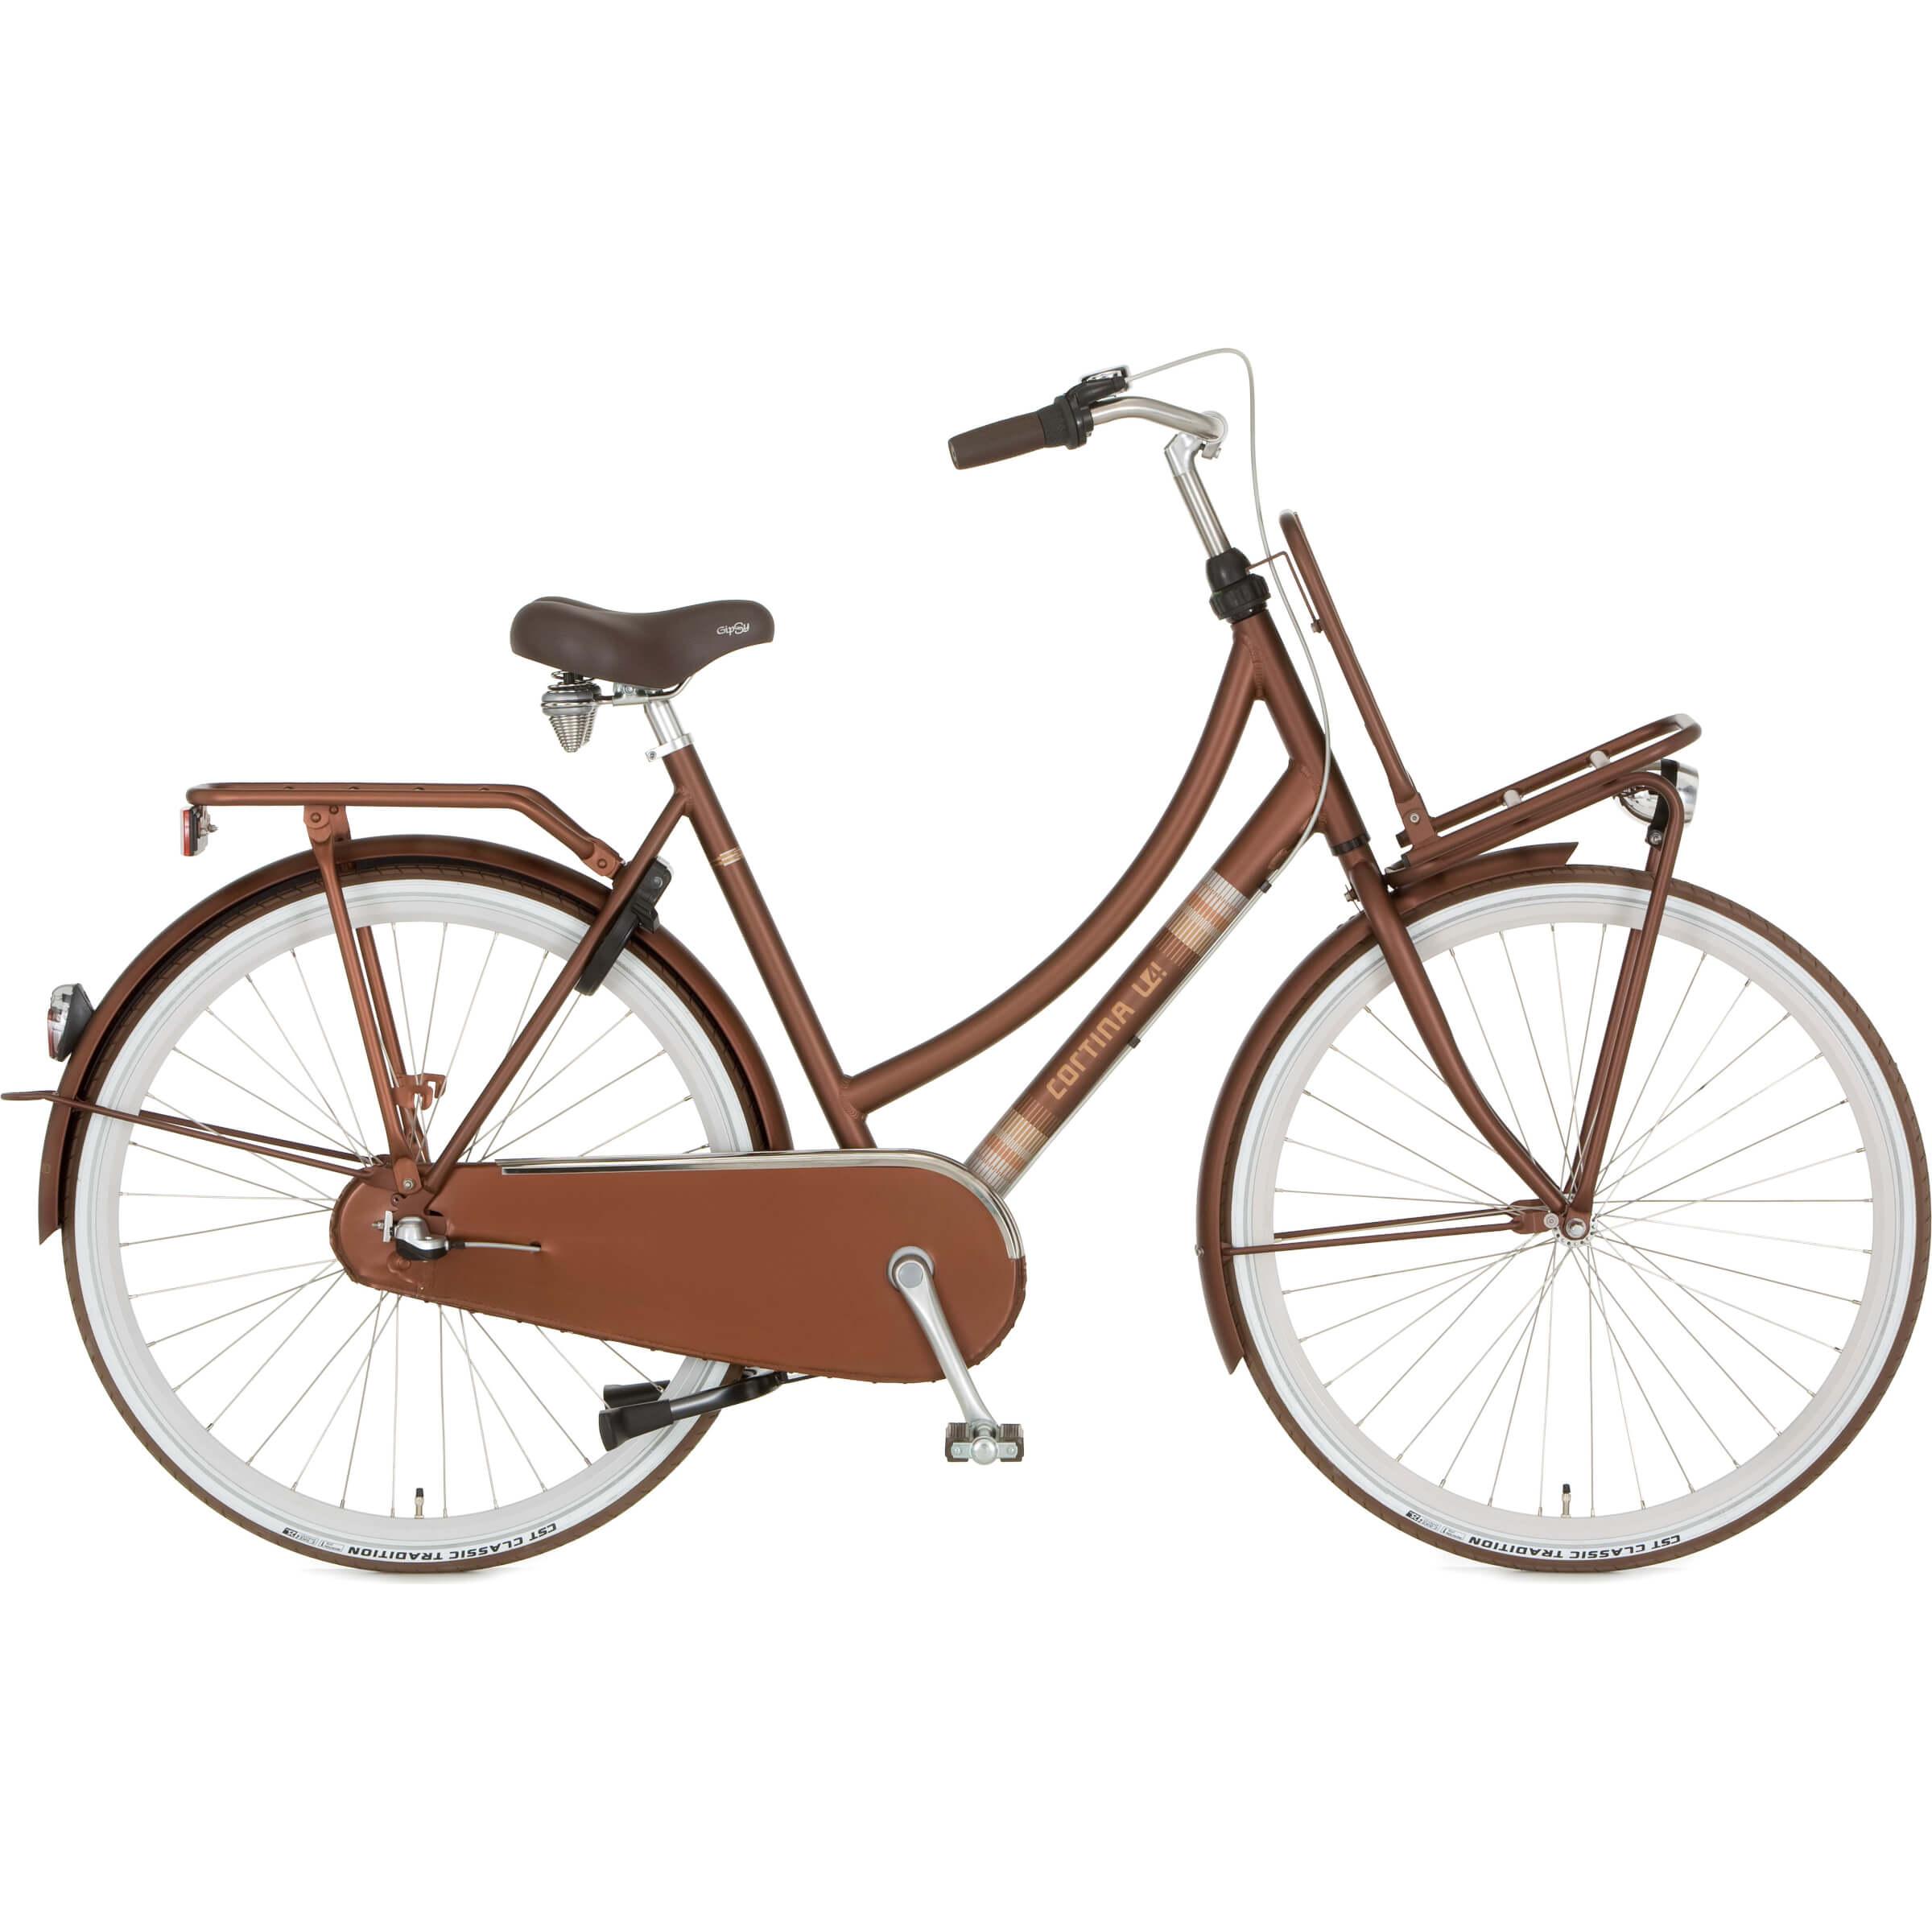 Cortina u4 transport sparkling brown